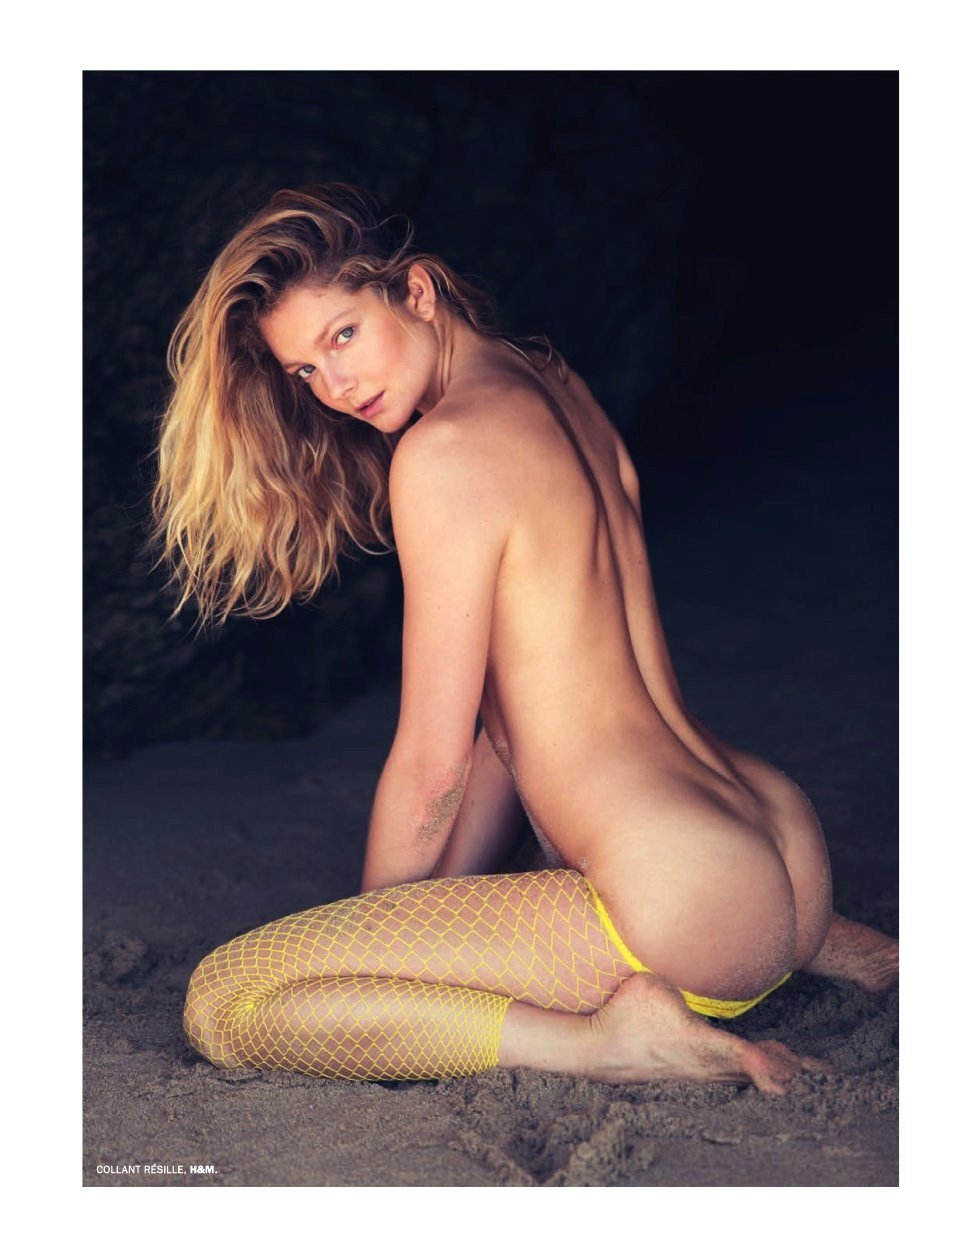 ... 1256 Eniko Mihalik – Lui Magazine Naked Photoshoot (October 2016